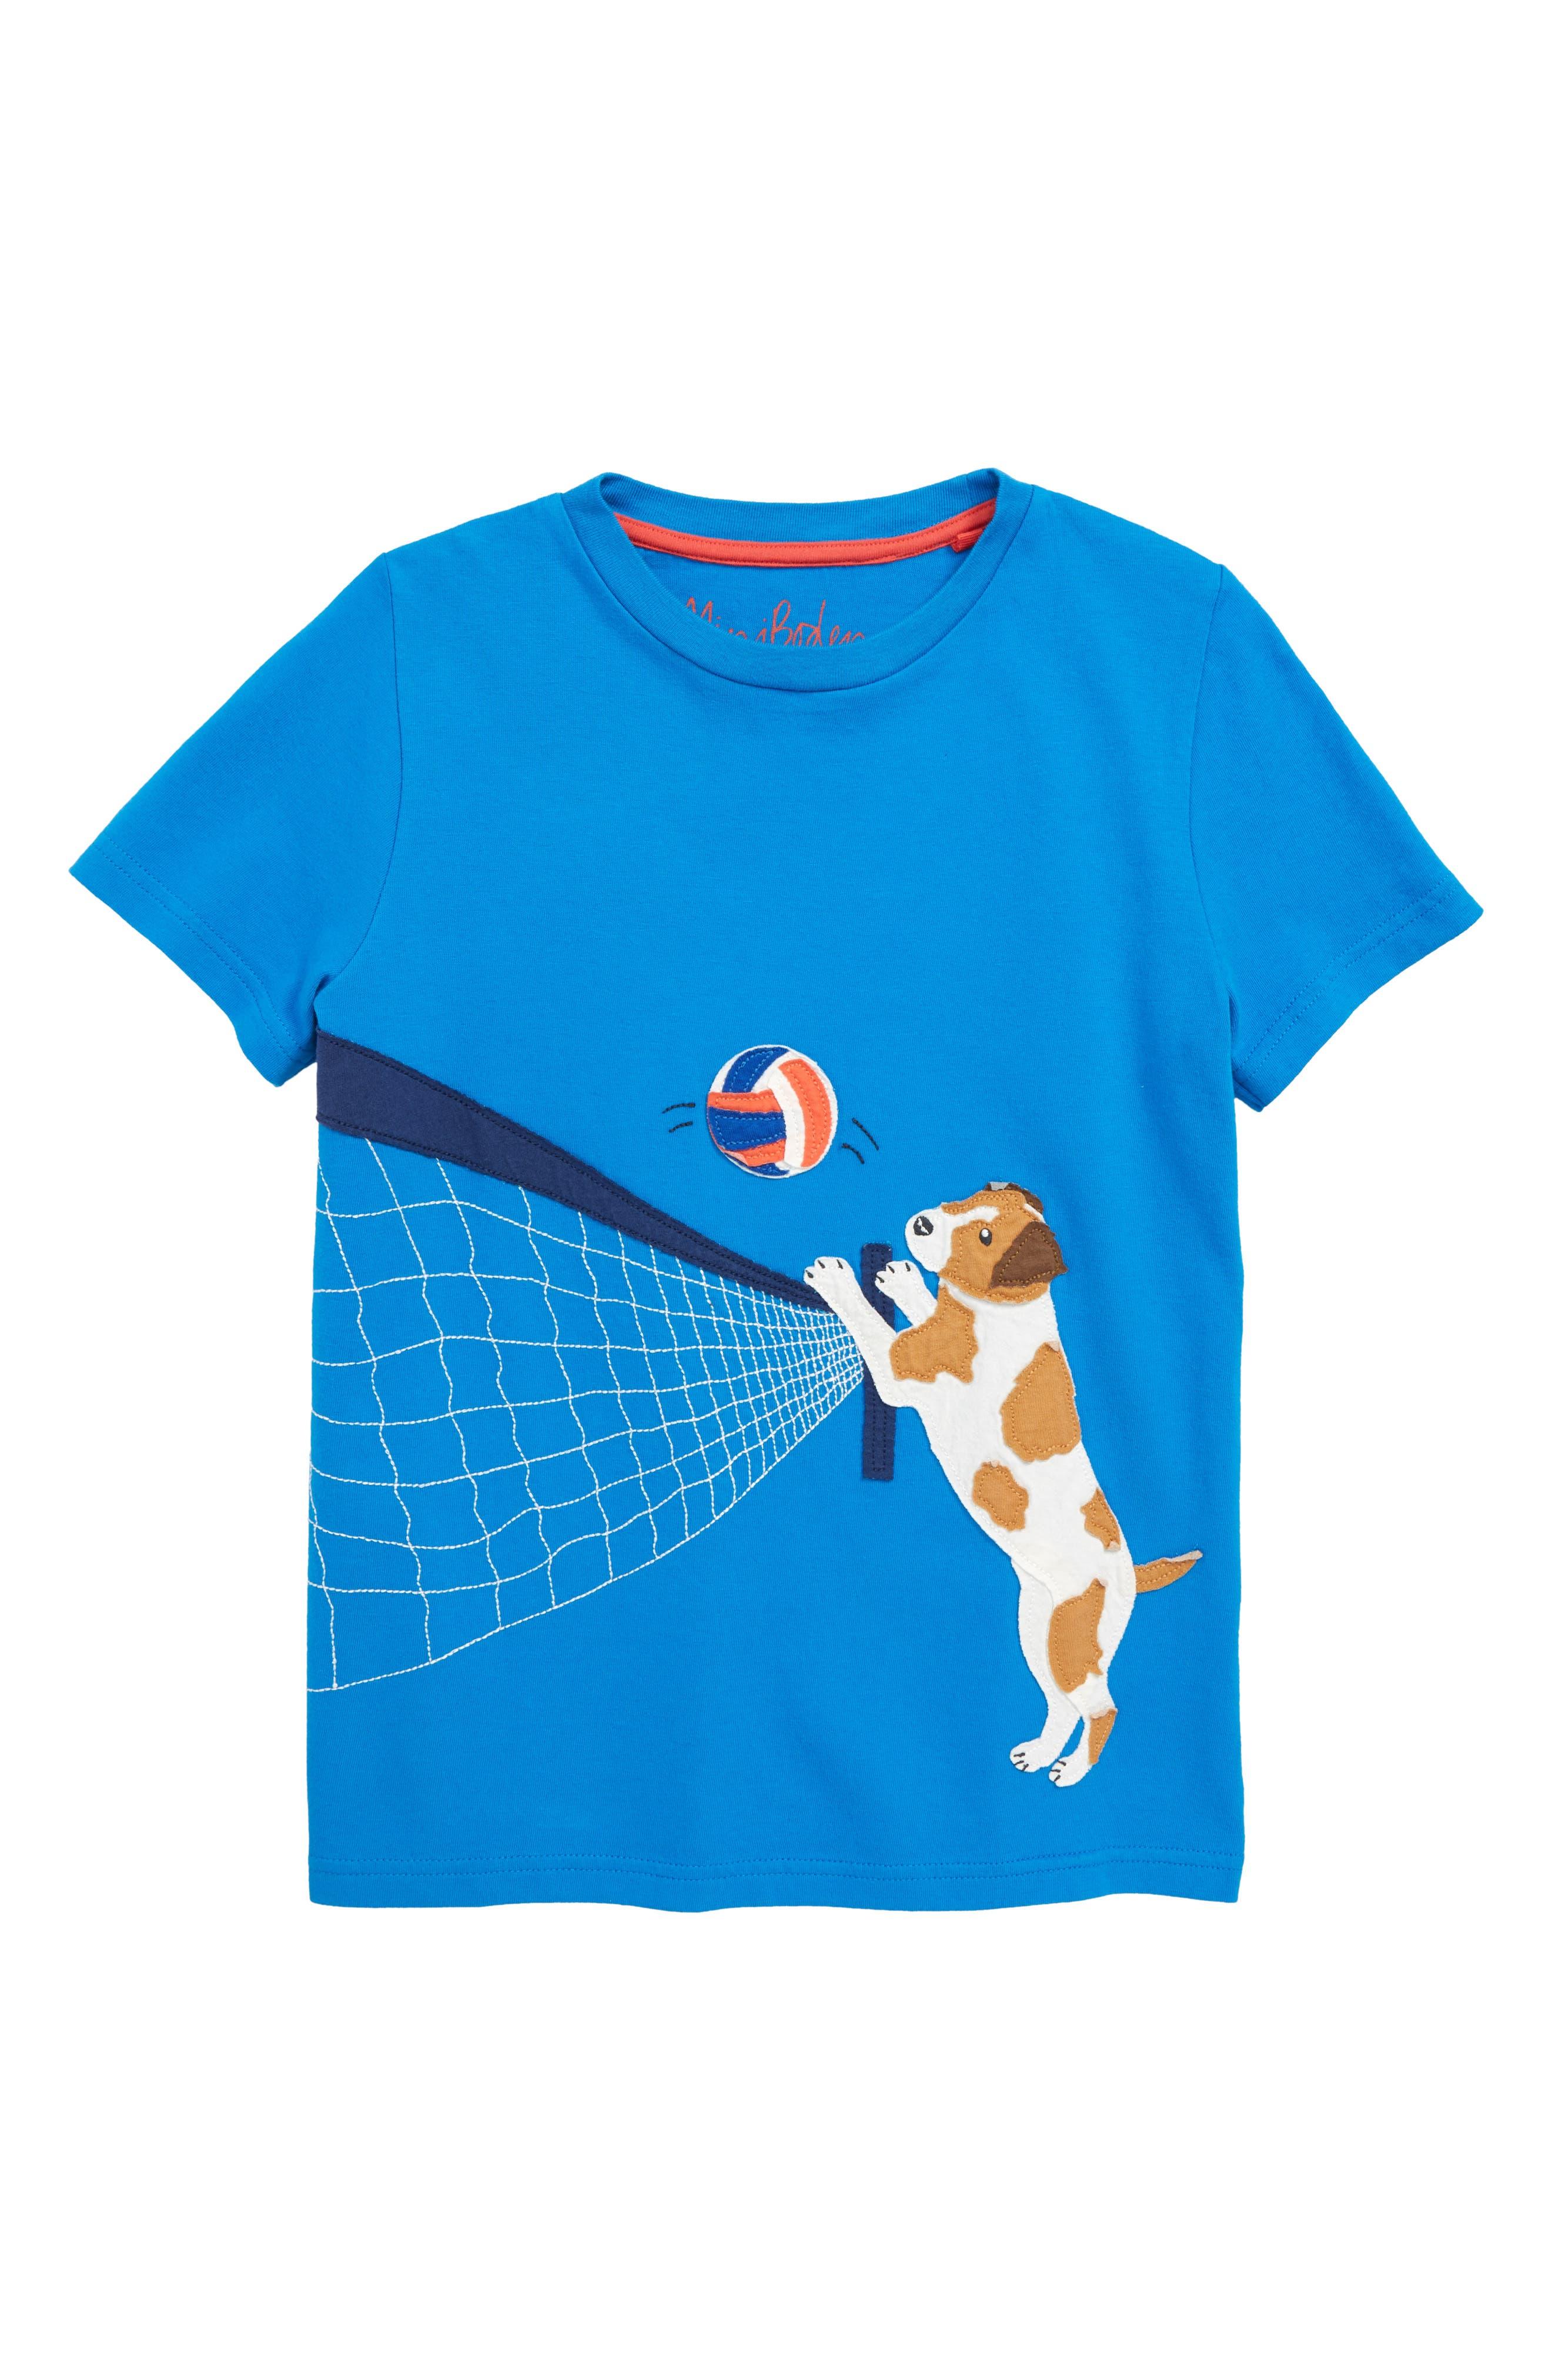 Beach Sports Appliqué T-Shirt,                         Main,                         color, Yogo Blue Volleyball